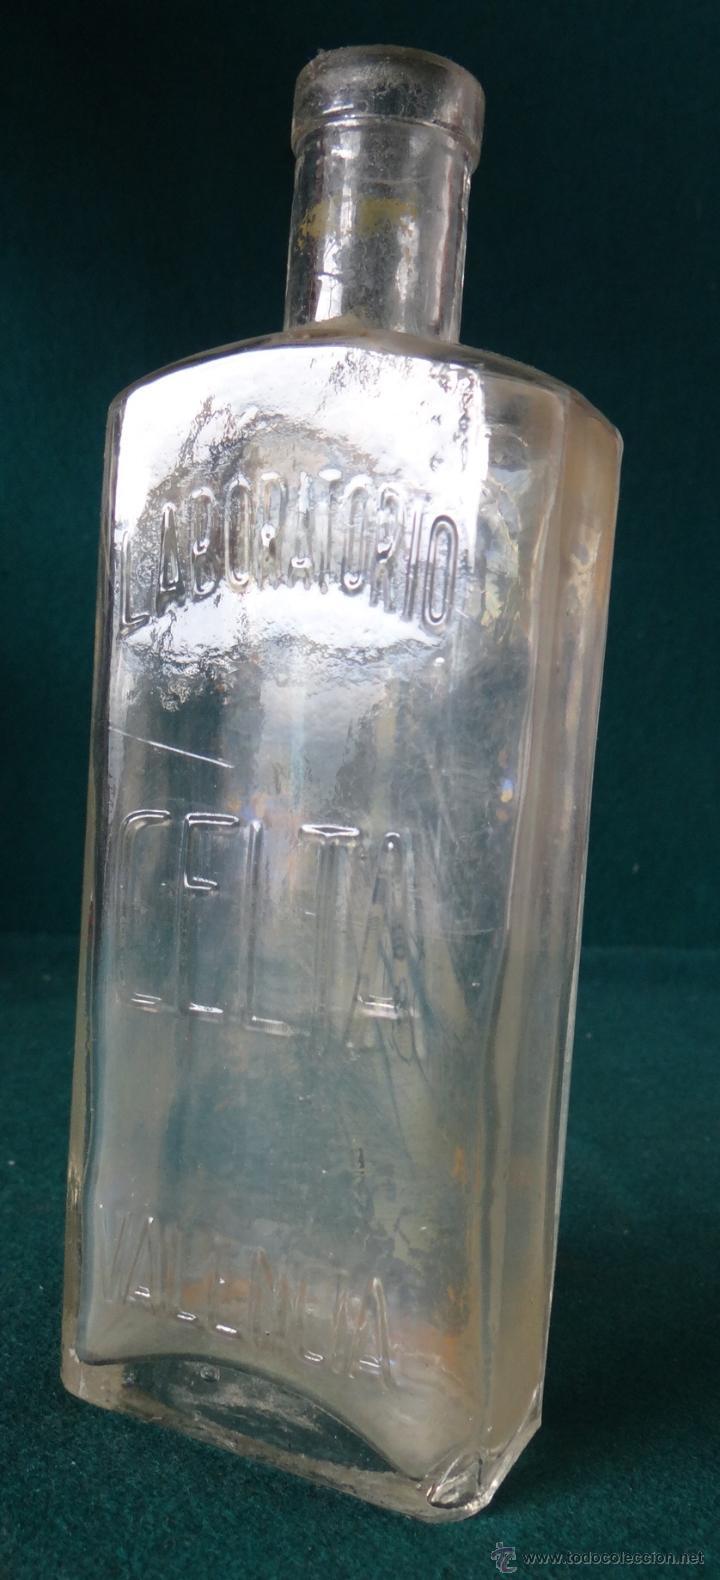 FRASCO FARMACIA - LABORATORIO CELTA - VALENCIA - (Antigüedades - Cristal y Vidrio - Farmacia )